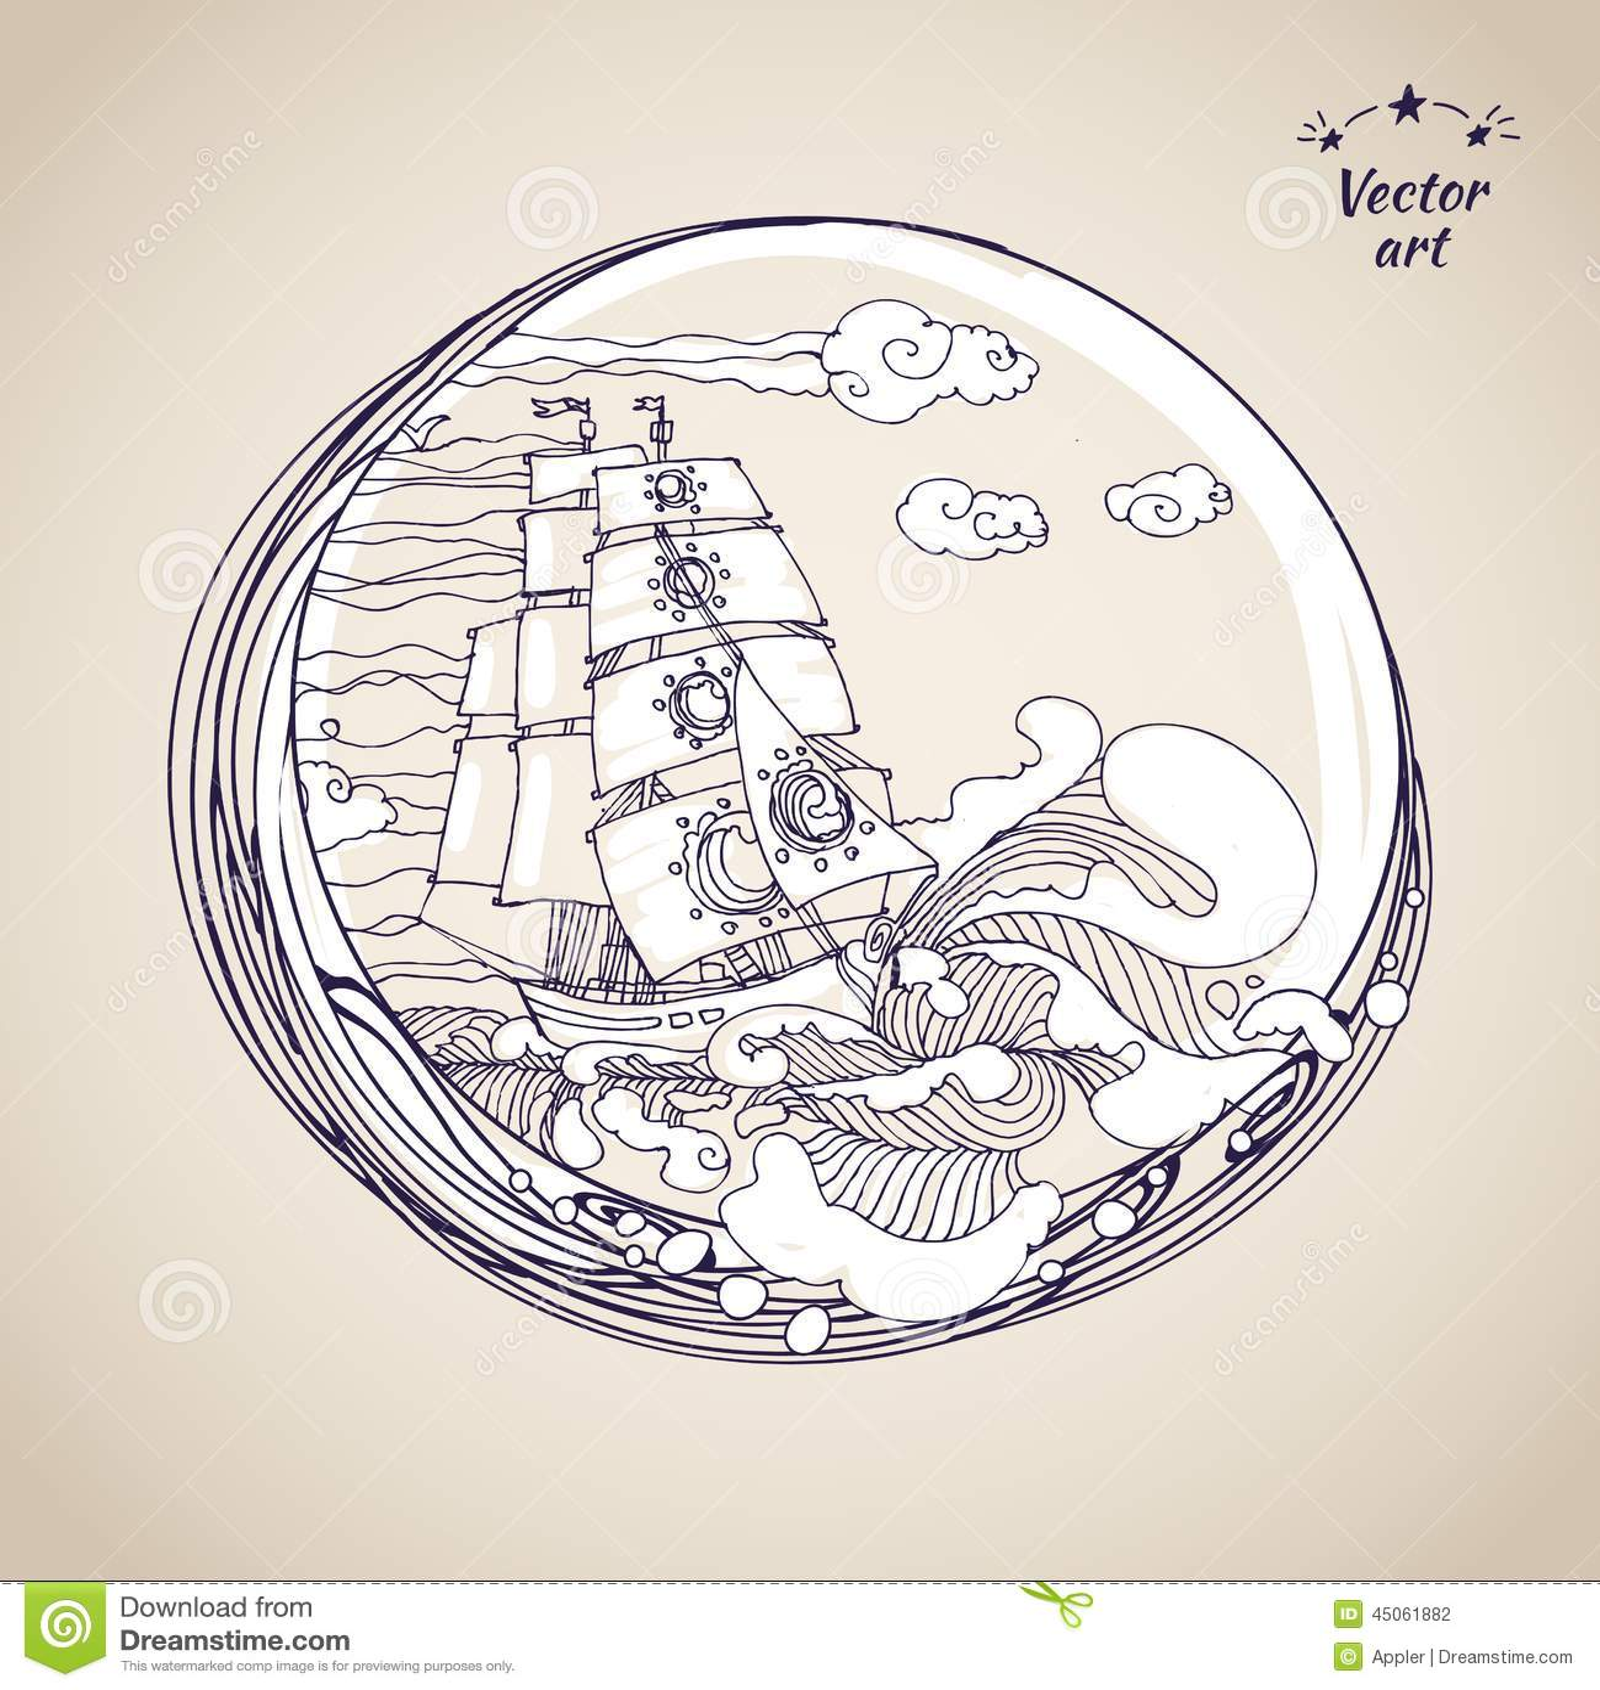 tsunami diagram with labels 1966 corvette starter wiring 2 sketch pen drawing sailfish at circle label stock vector